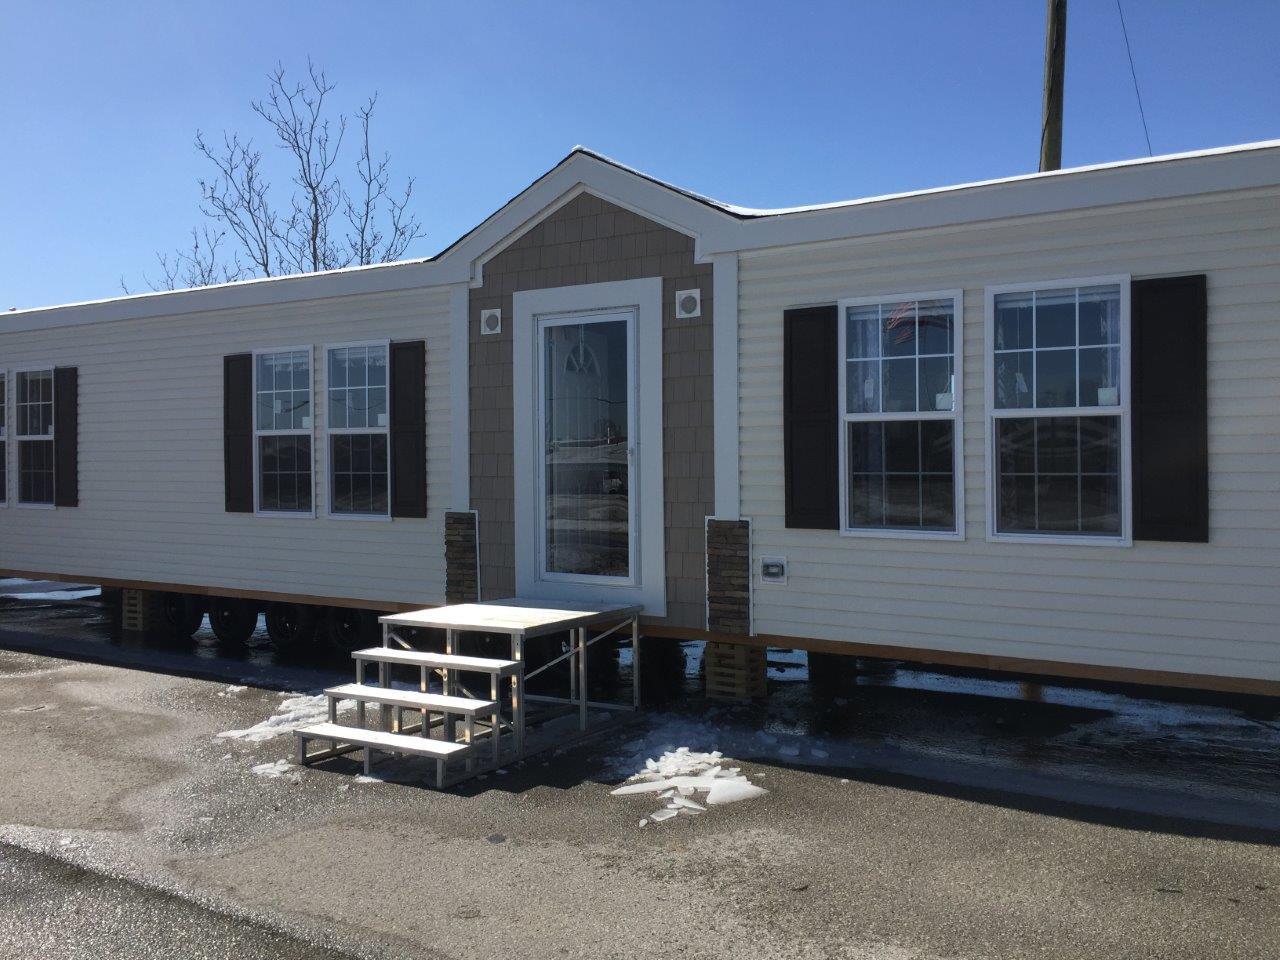 Ark-La-Tex Homes – Manufactured Mobile Homes for the the Northern on houston tex, dallas tex, louisiana tex, latex tex,